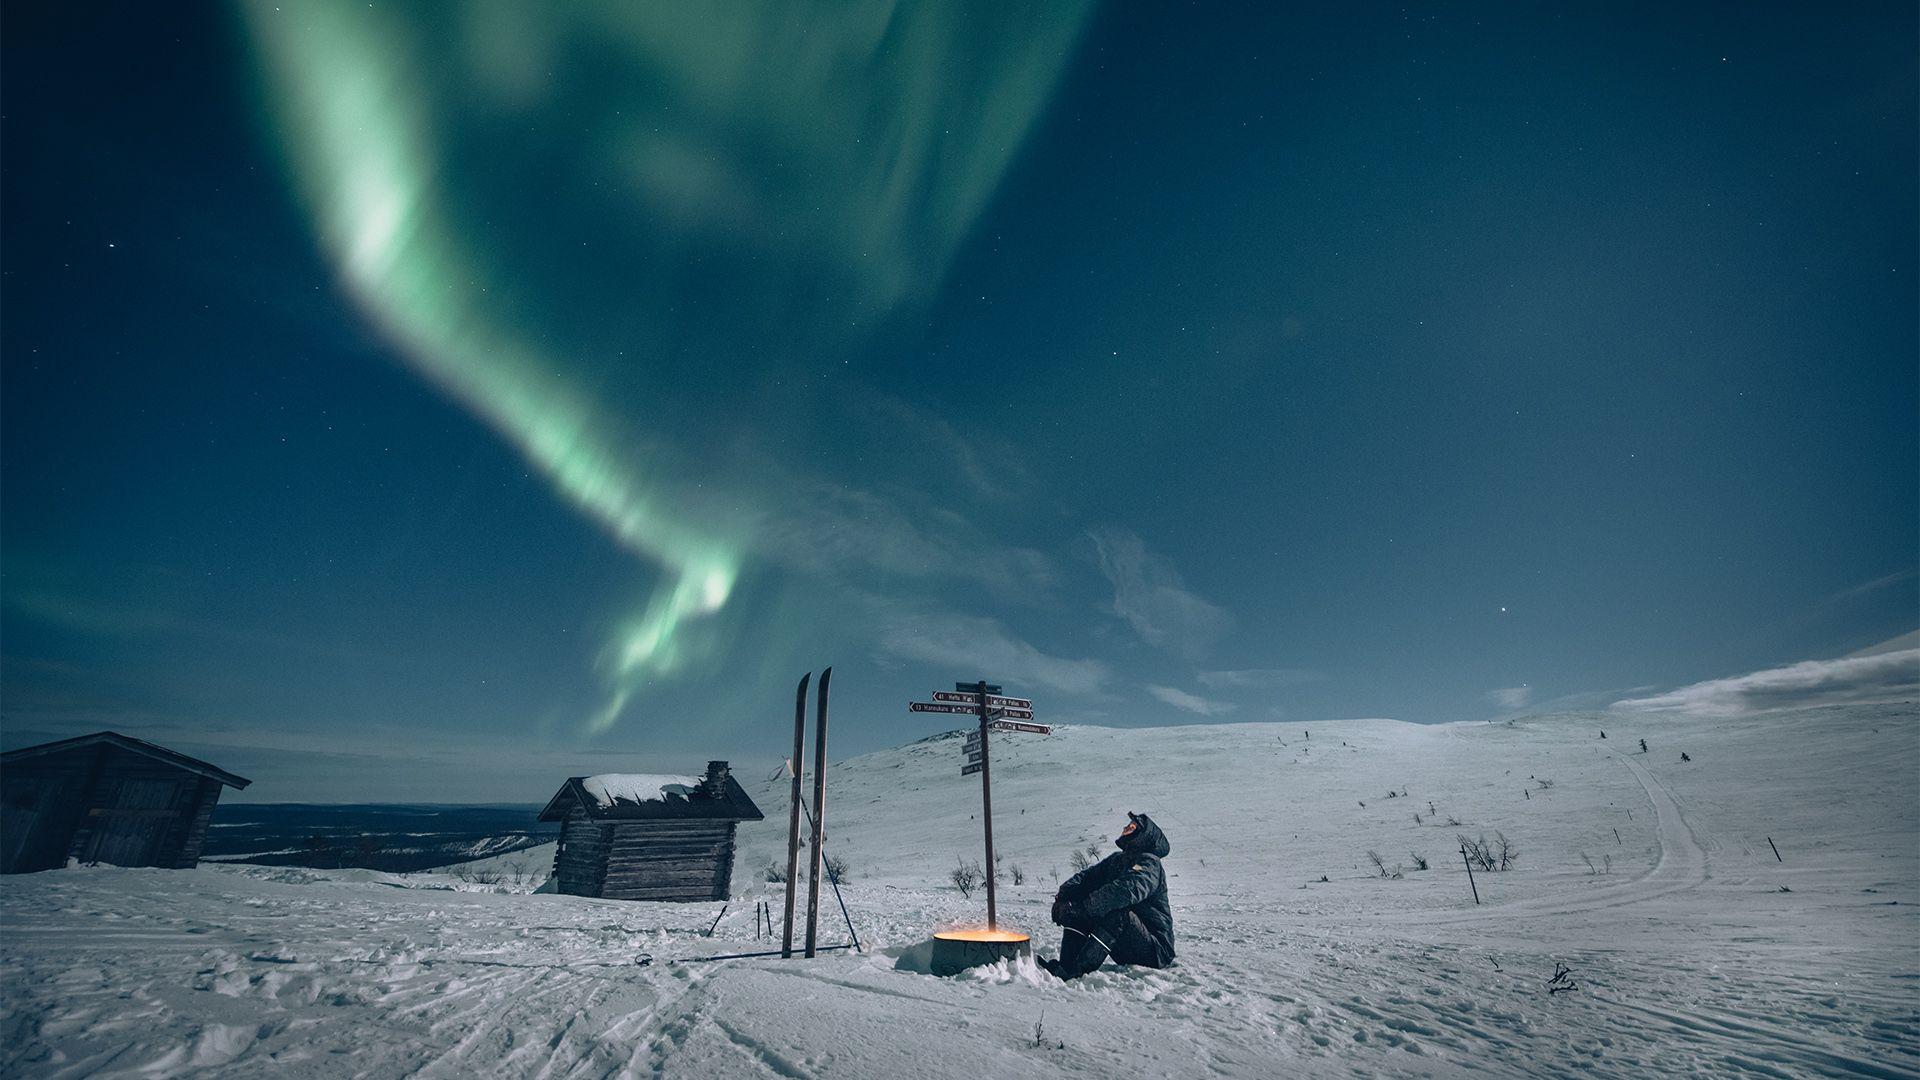 Winter in Lapland Finland